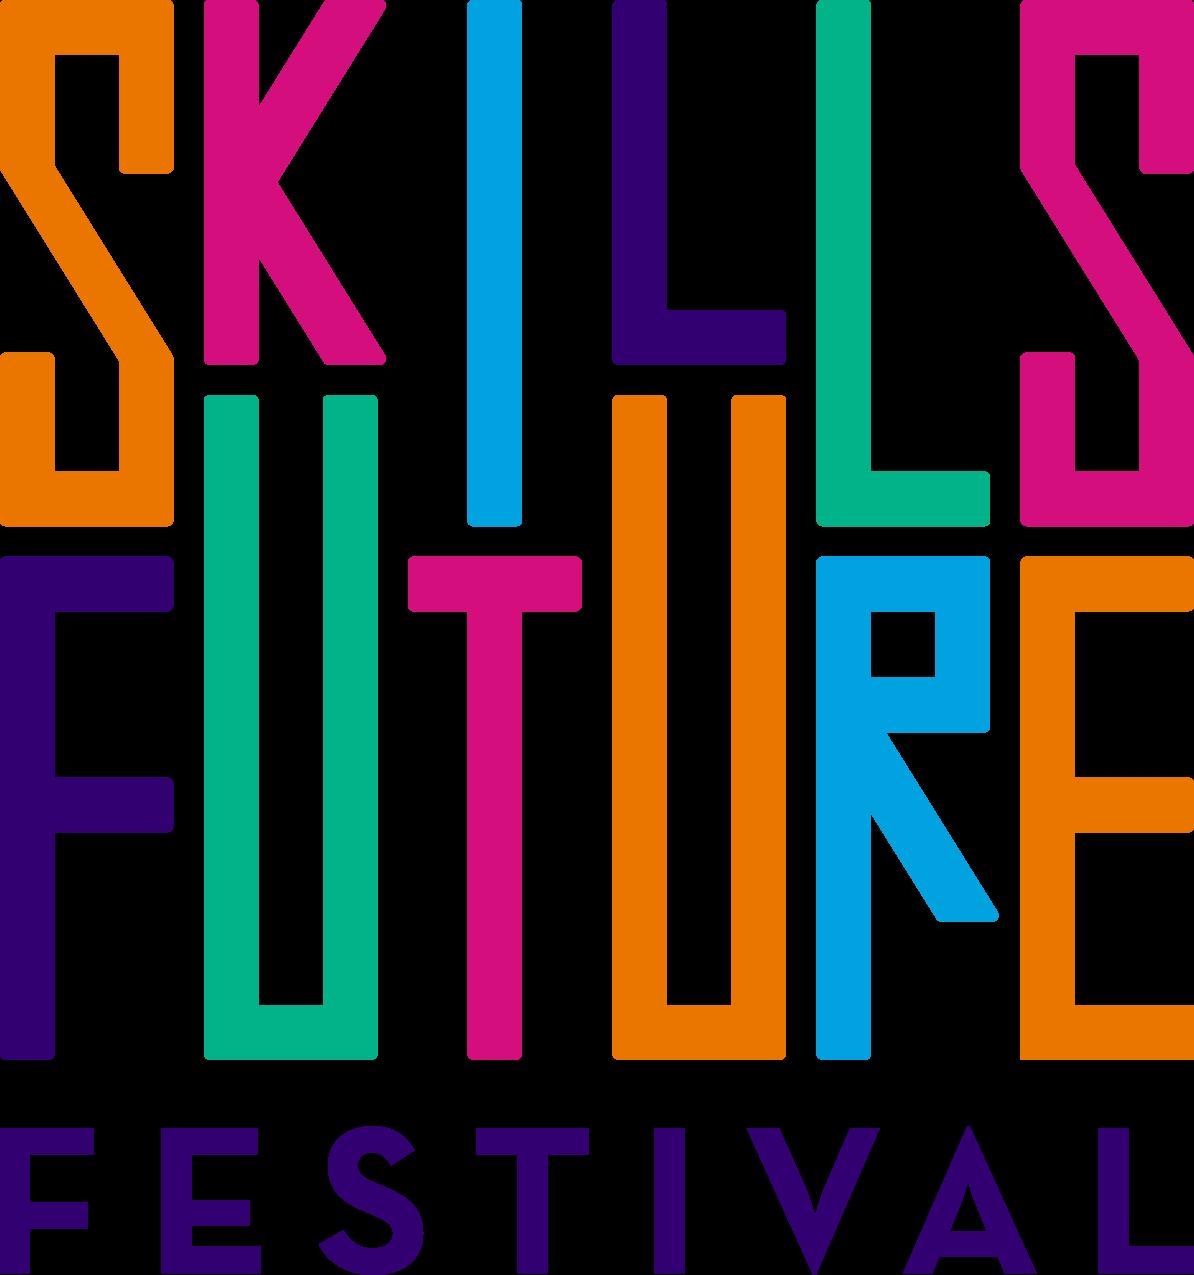 SkillsFutureLogo_0630